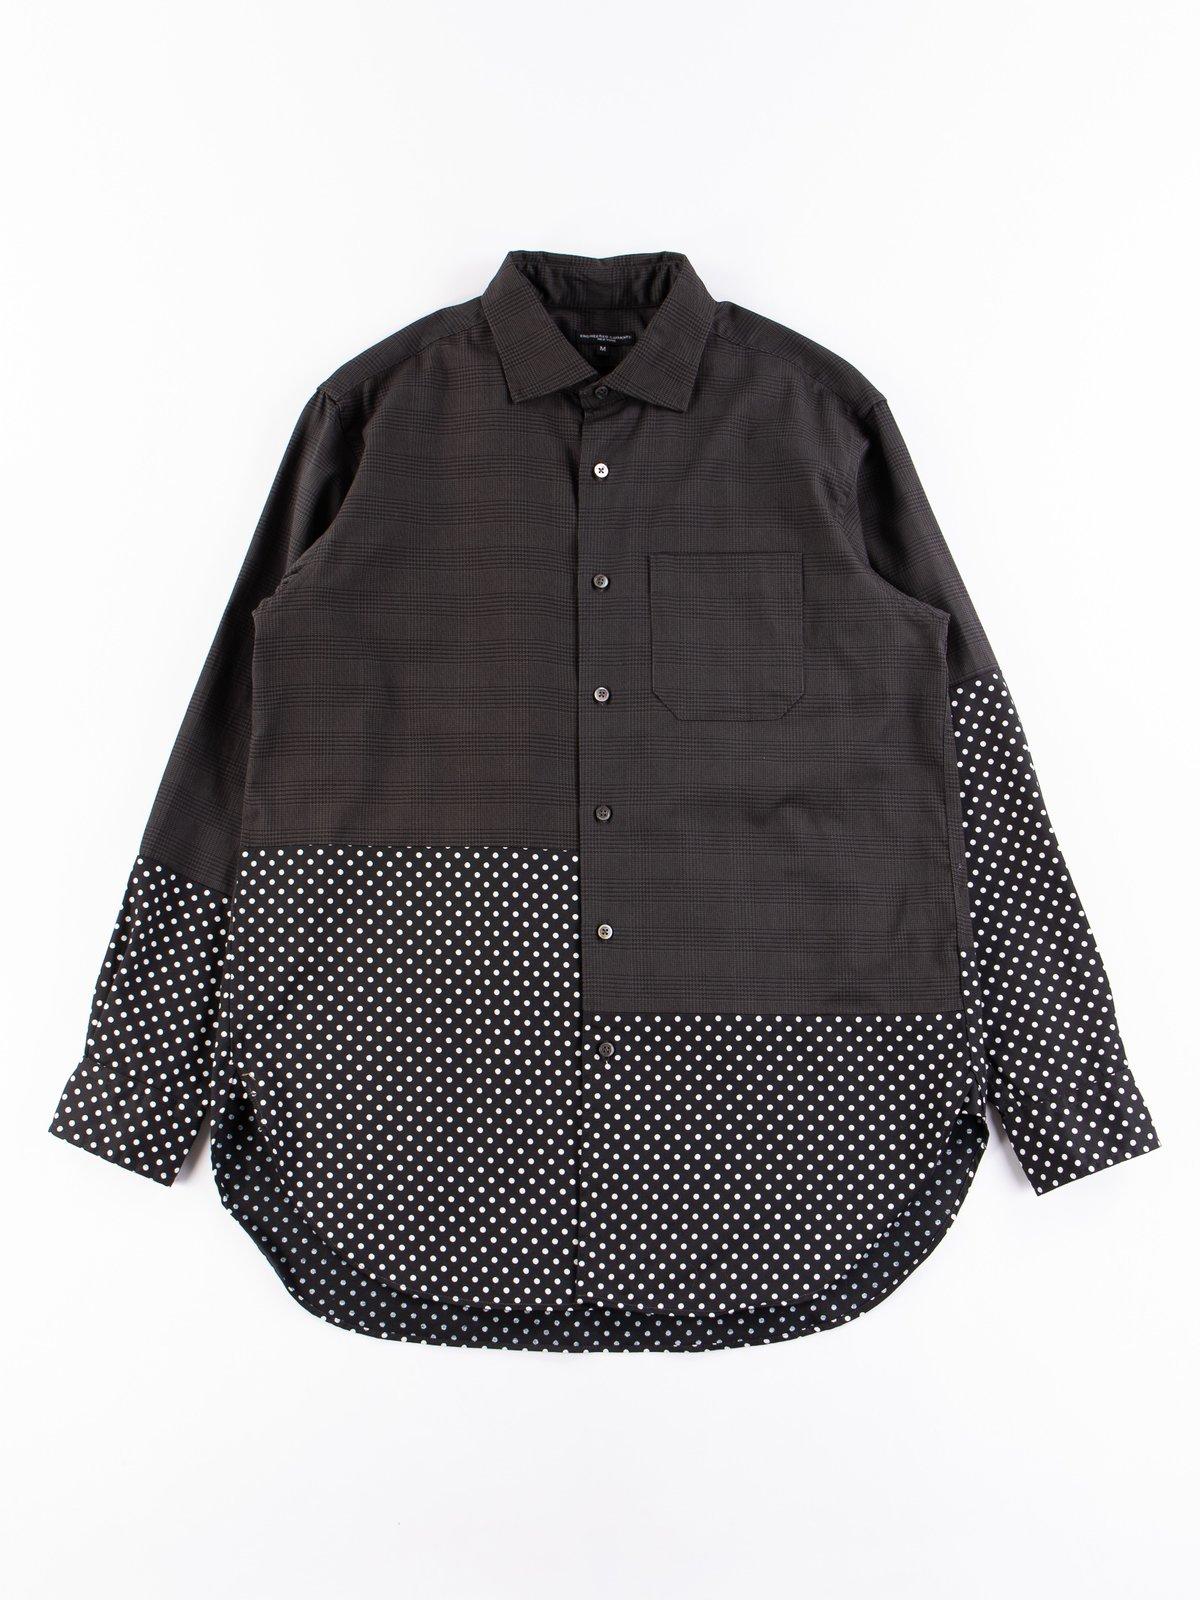 Grey Twill Printed Glen Plaid Spread Collar Shirt - Image 1